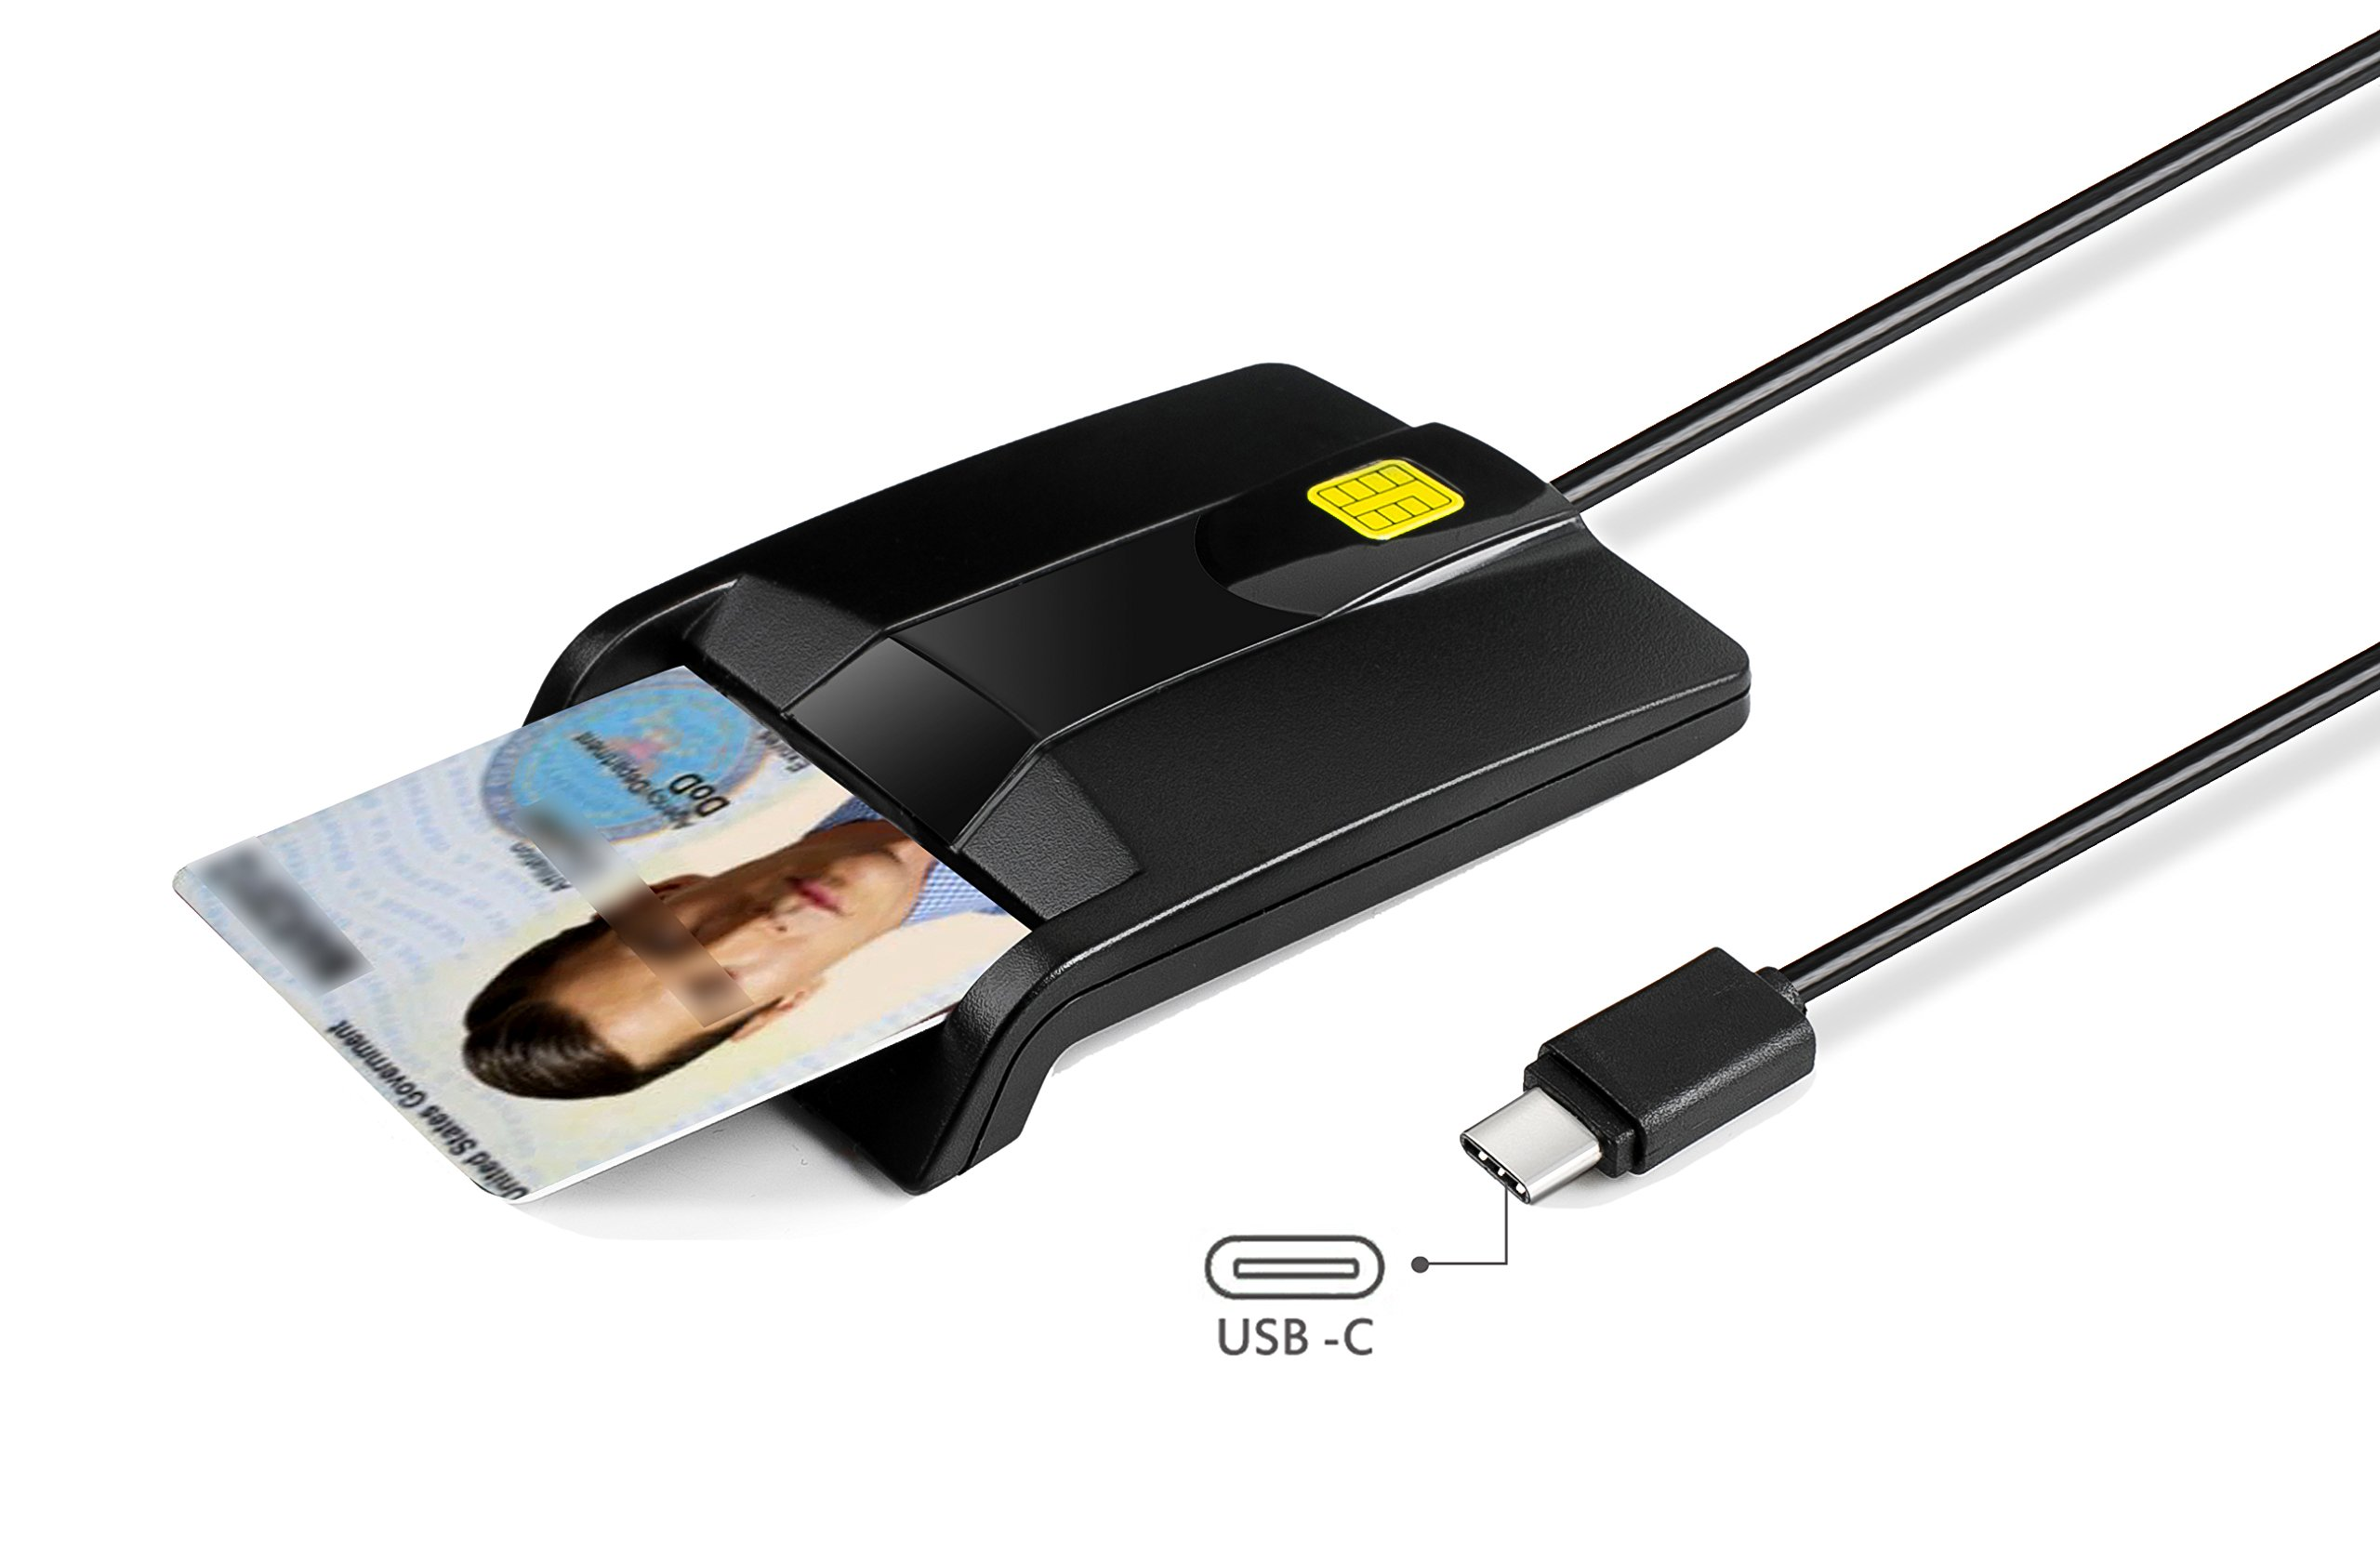 Type C Smart Card Reader Saicoo DOD Military USB-C Common Access CAC Card Reader, Compatible with Windows (32/64bit) XP/Vista/ 7/8/10, Mac OS X